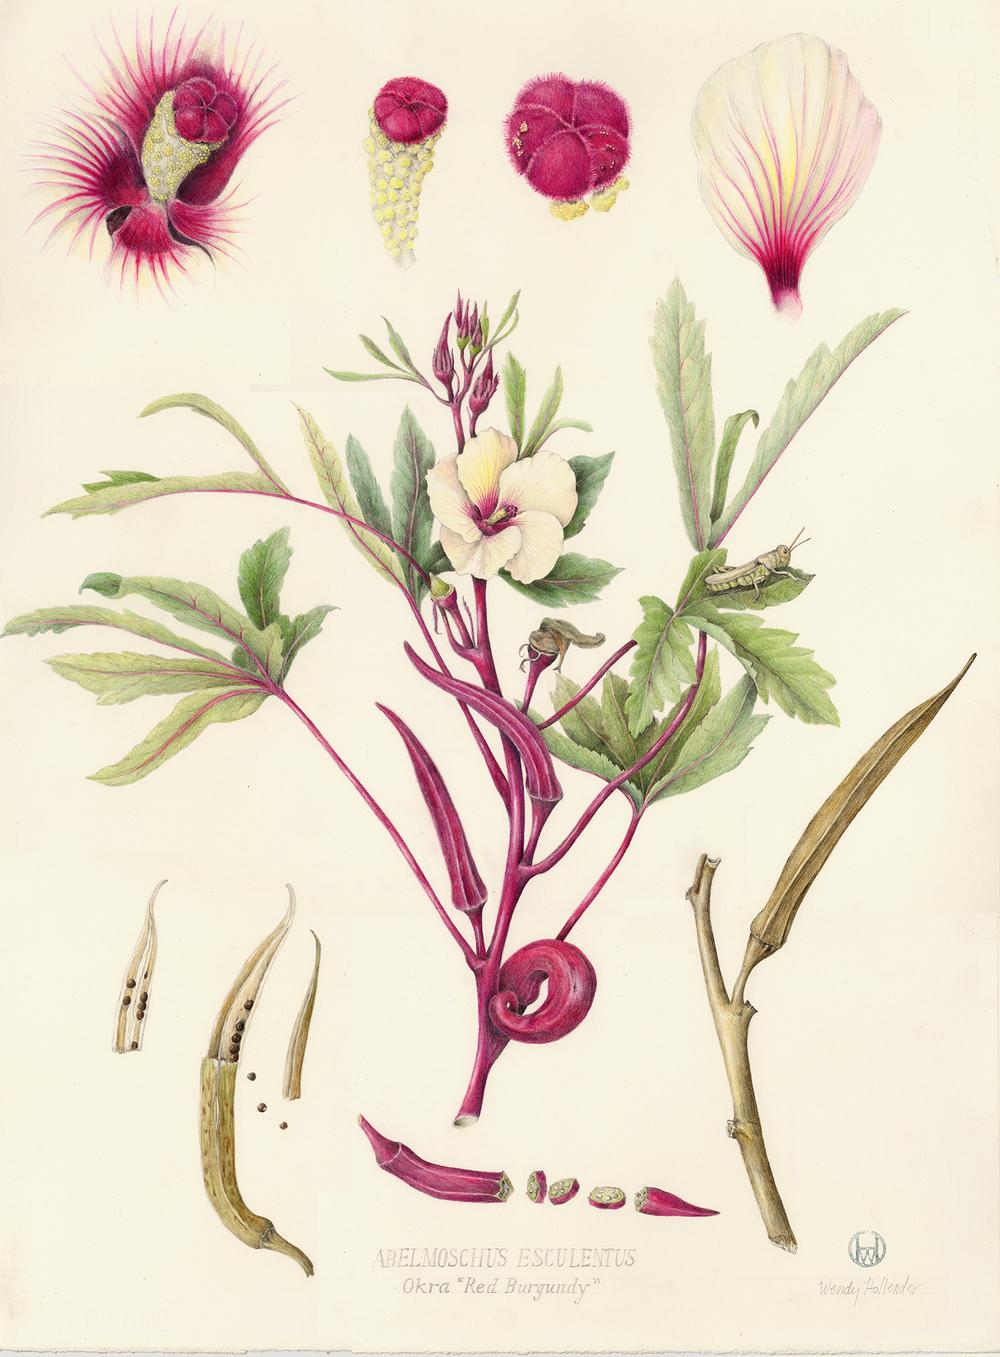 Okra - Abelmoschus esculentus